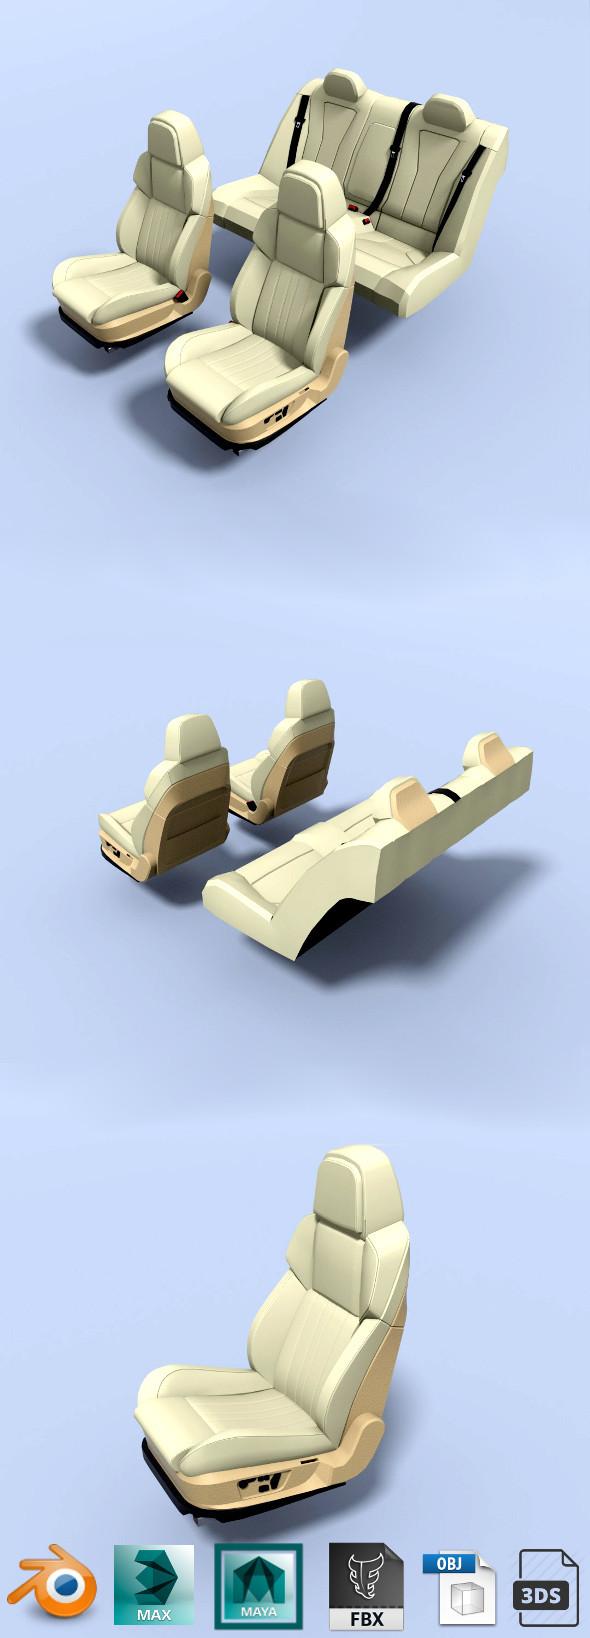 car seats - 3DOcean Item for Sale